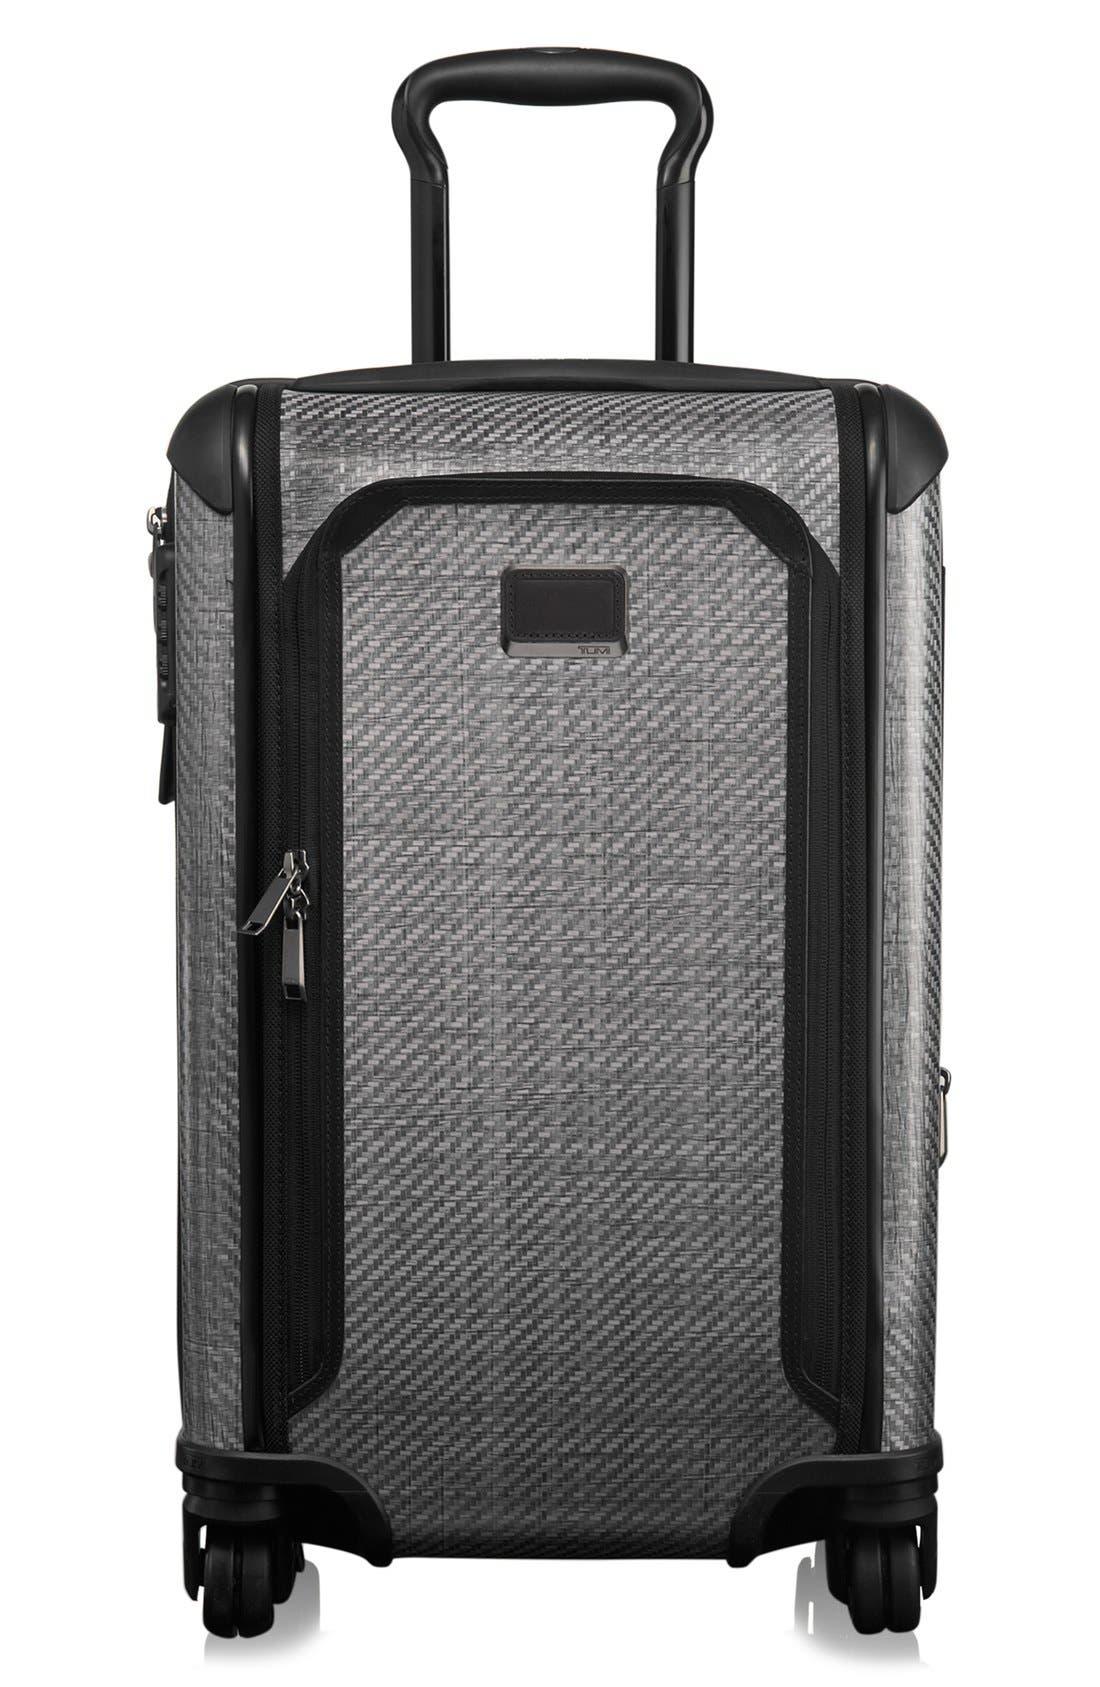 TUMI Tegra-Lite<sup>™</sup> Max International Expandable Carry-On